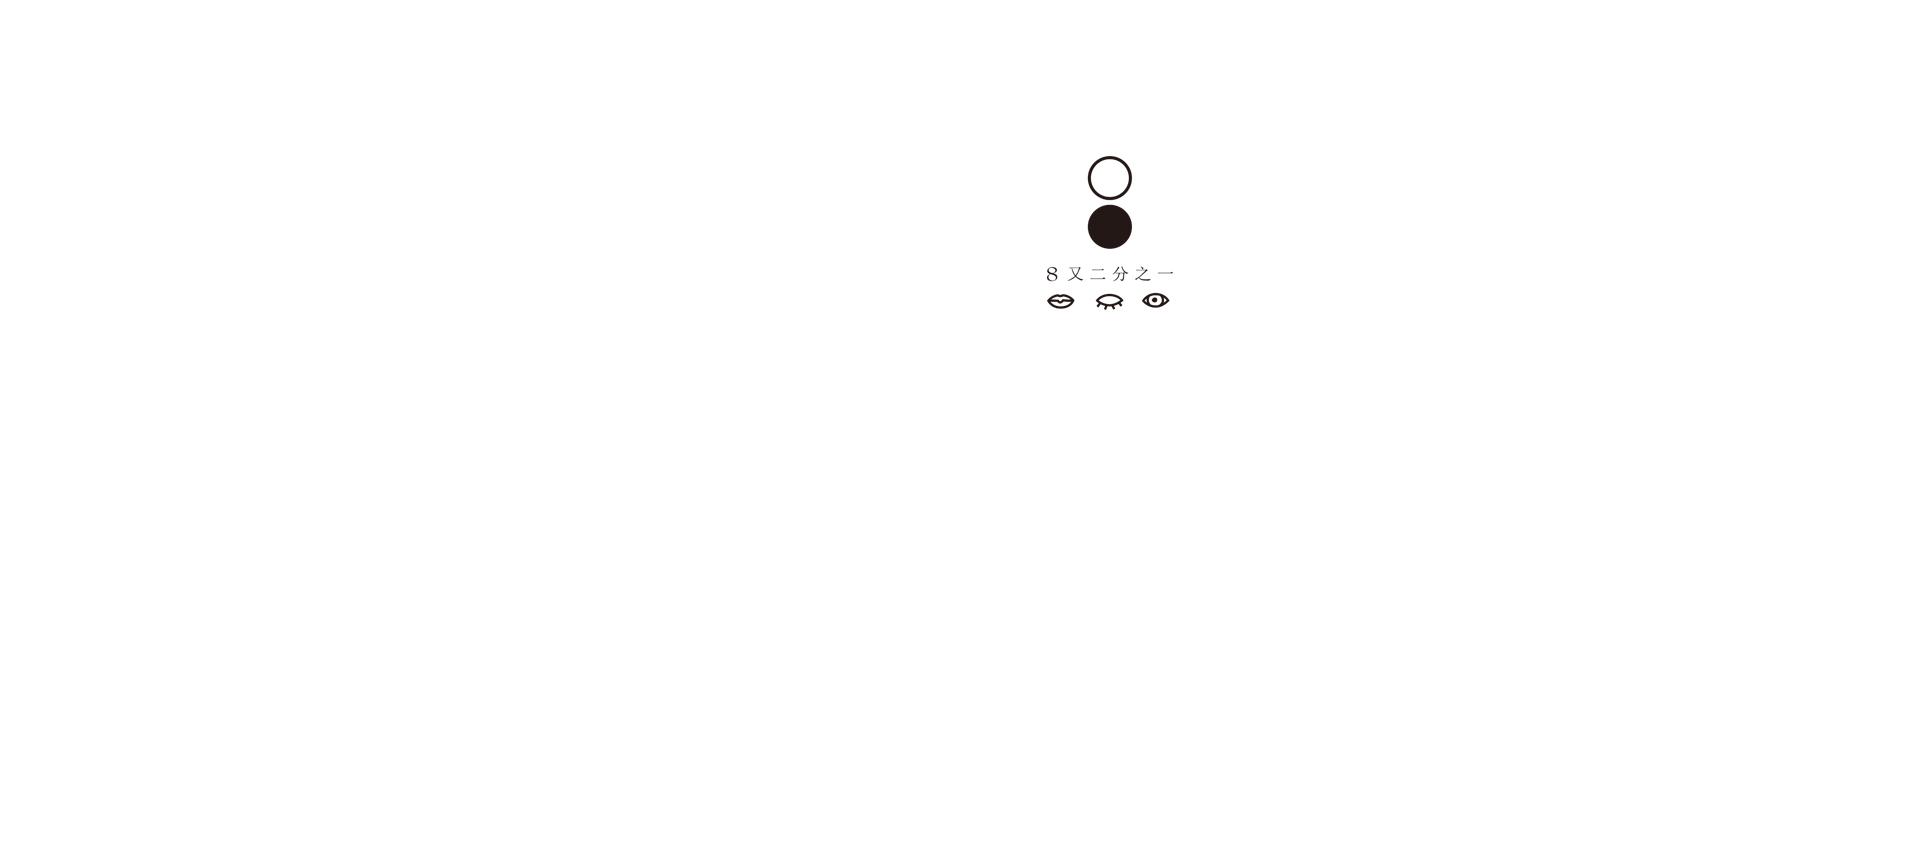 首頁page logo拷貝-4